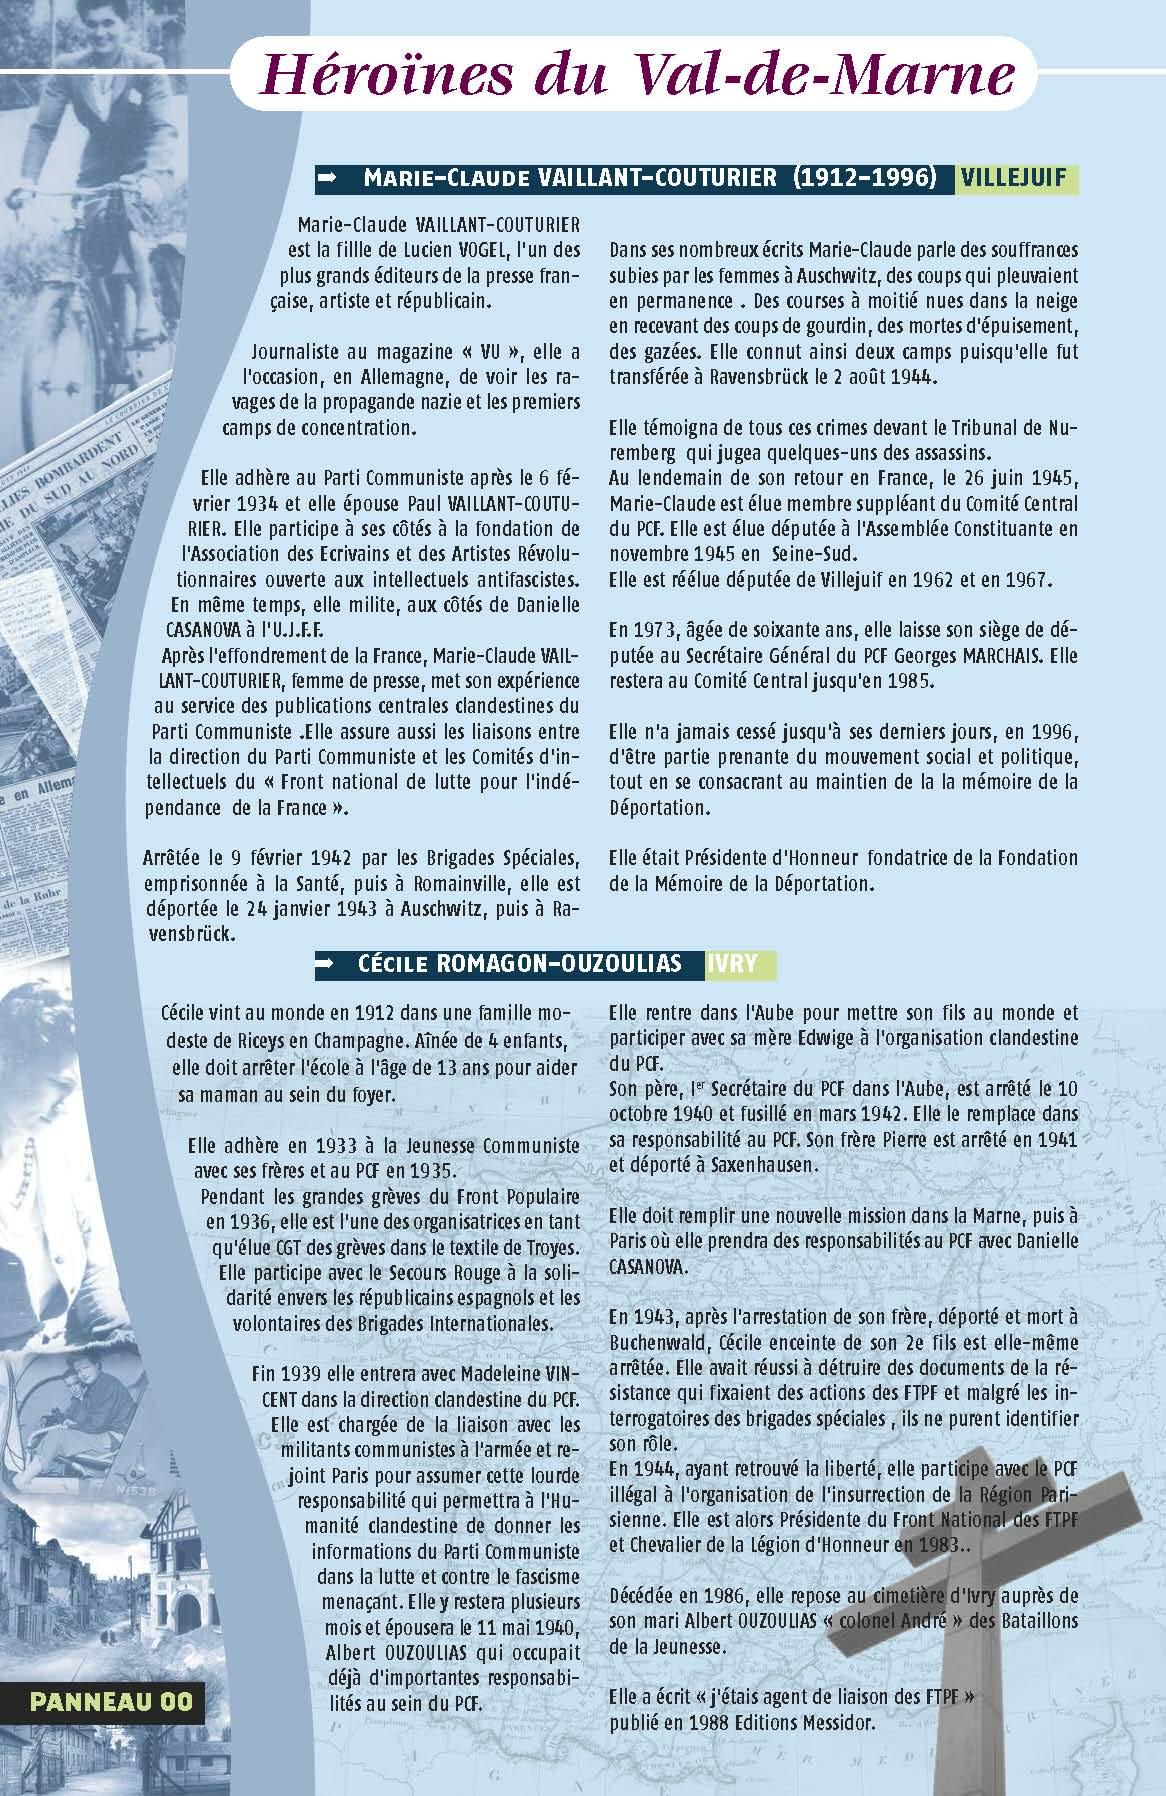 Pano8 11 page 4